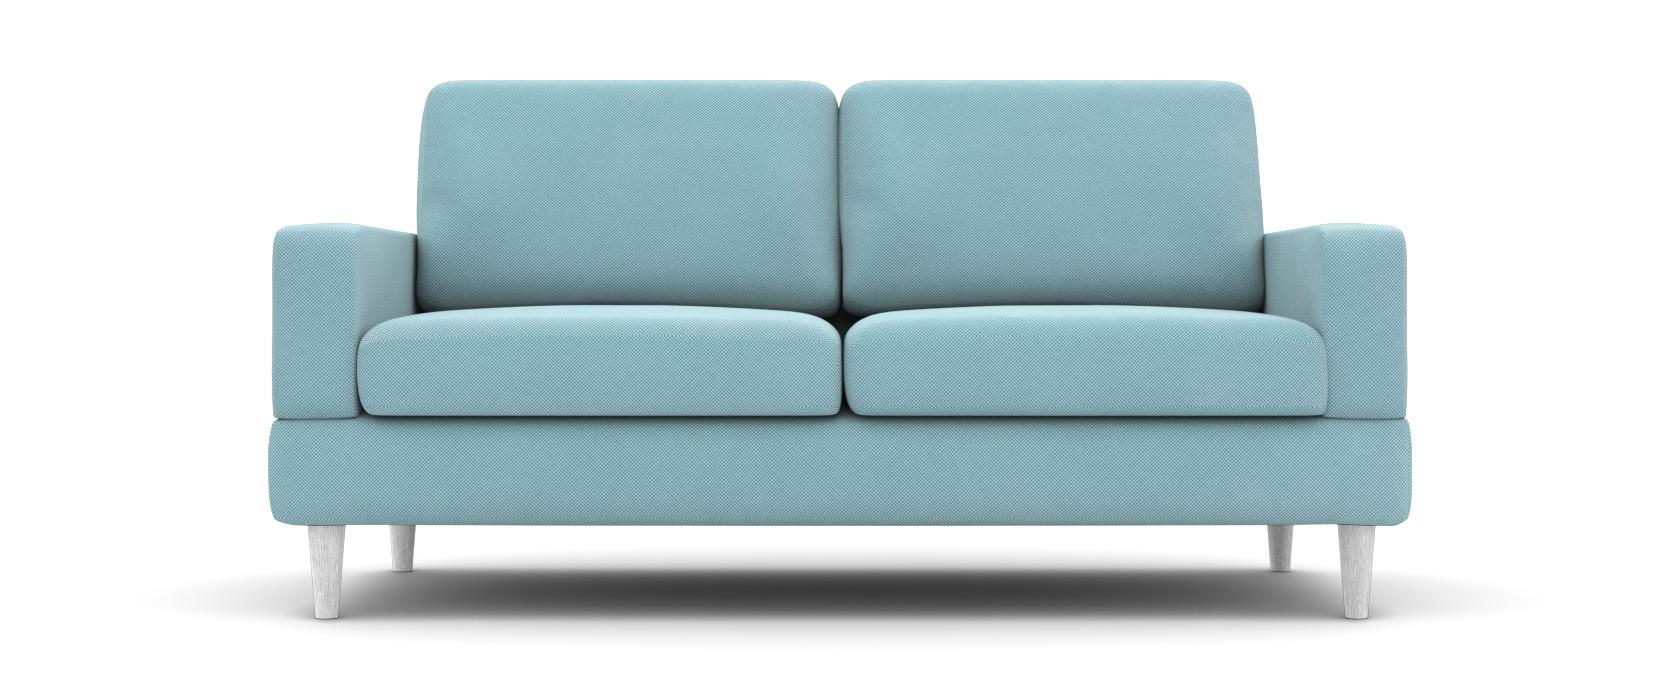 Двухместный диван Bruno - Pufetto